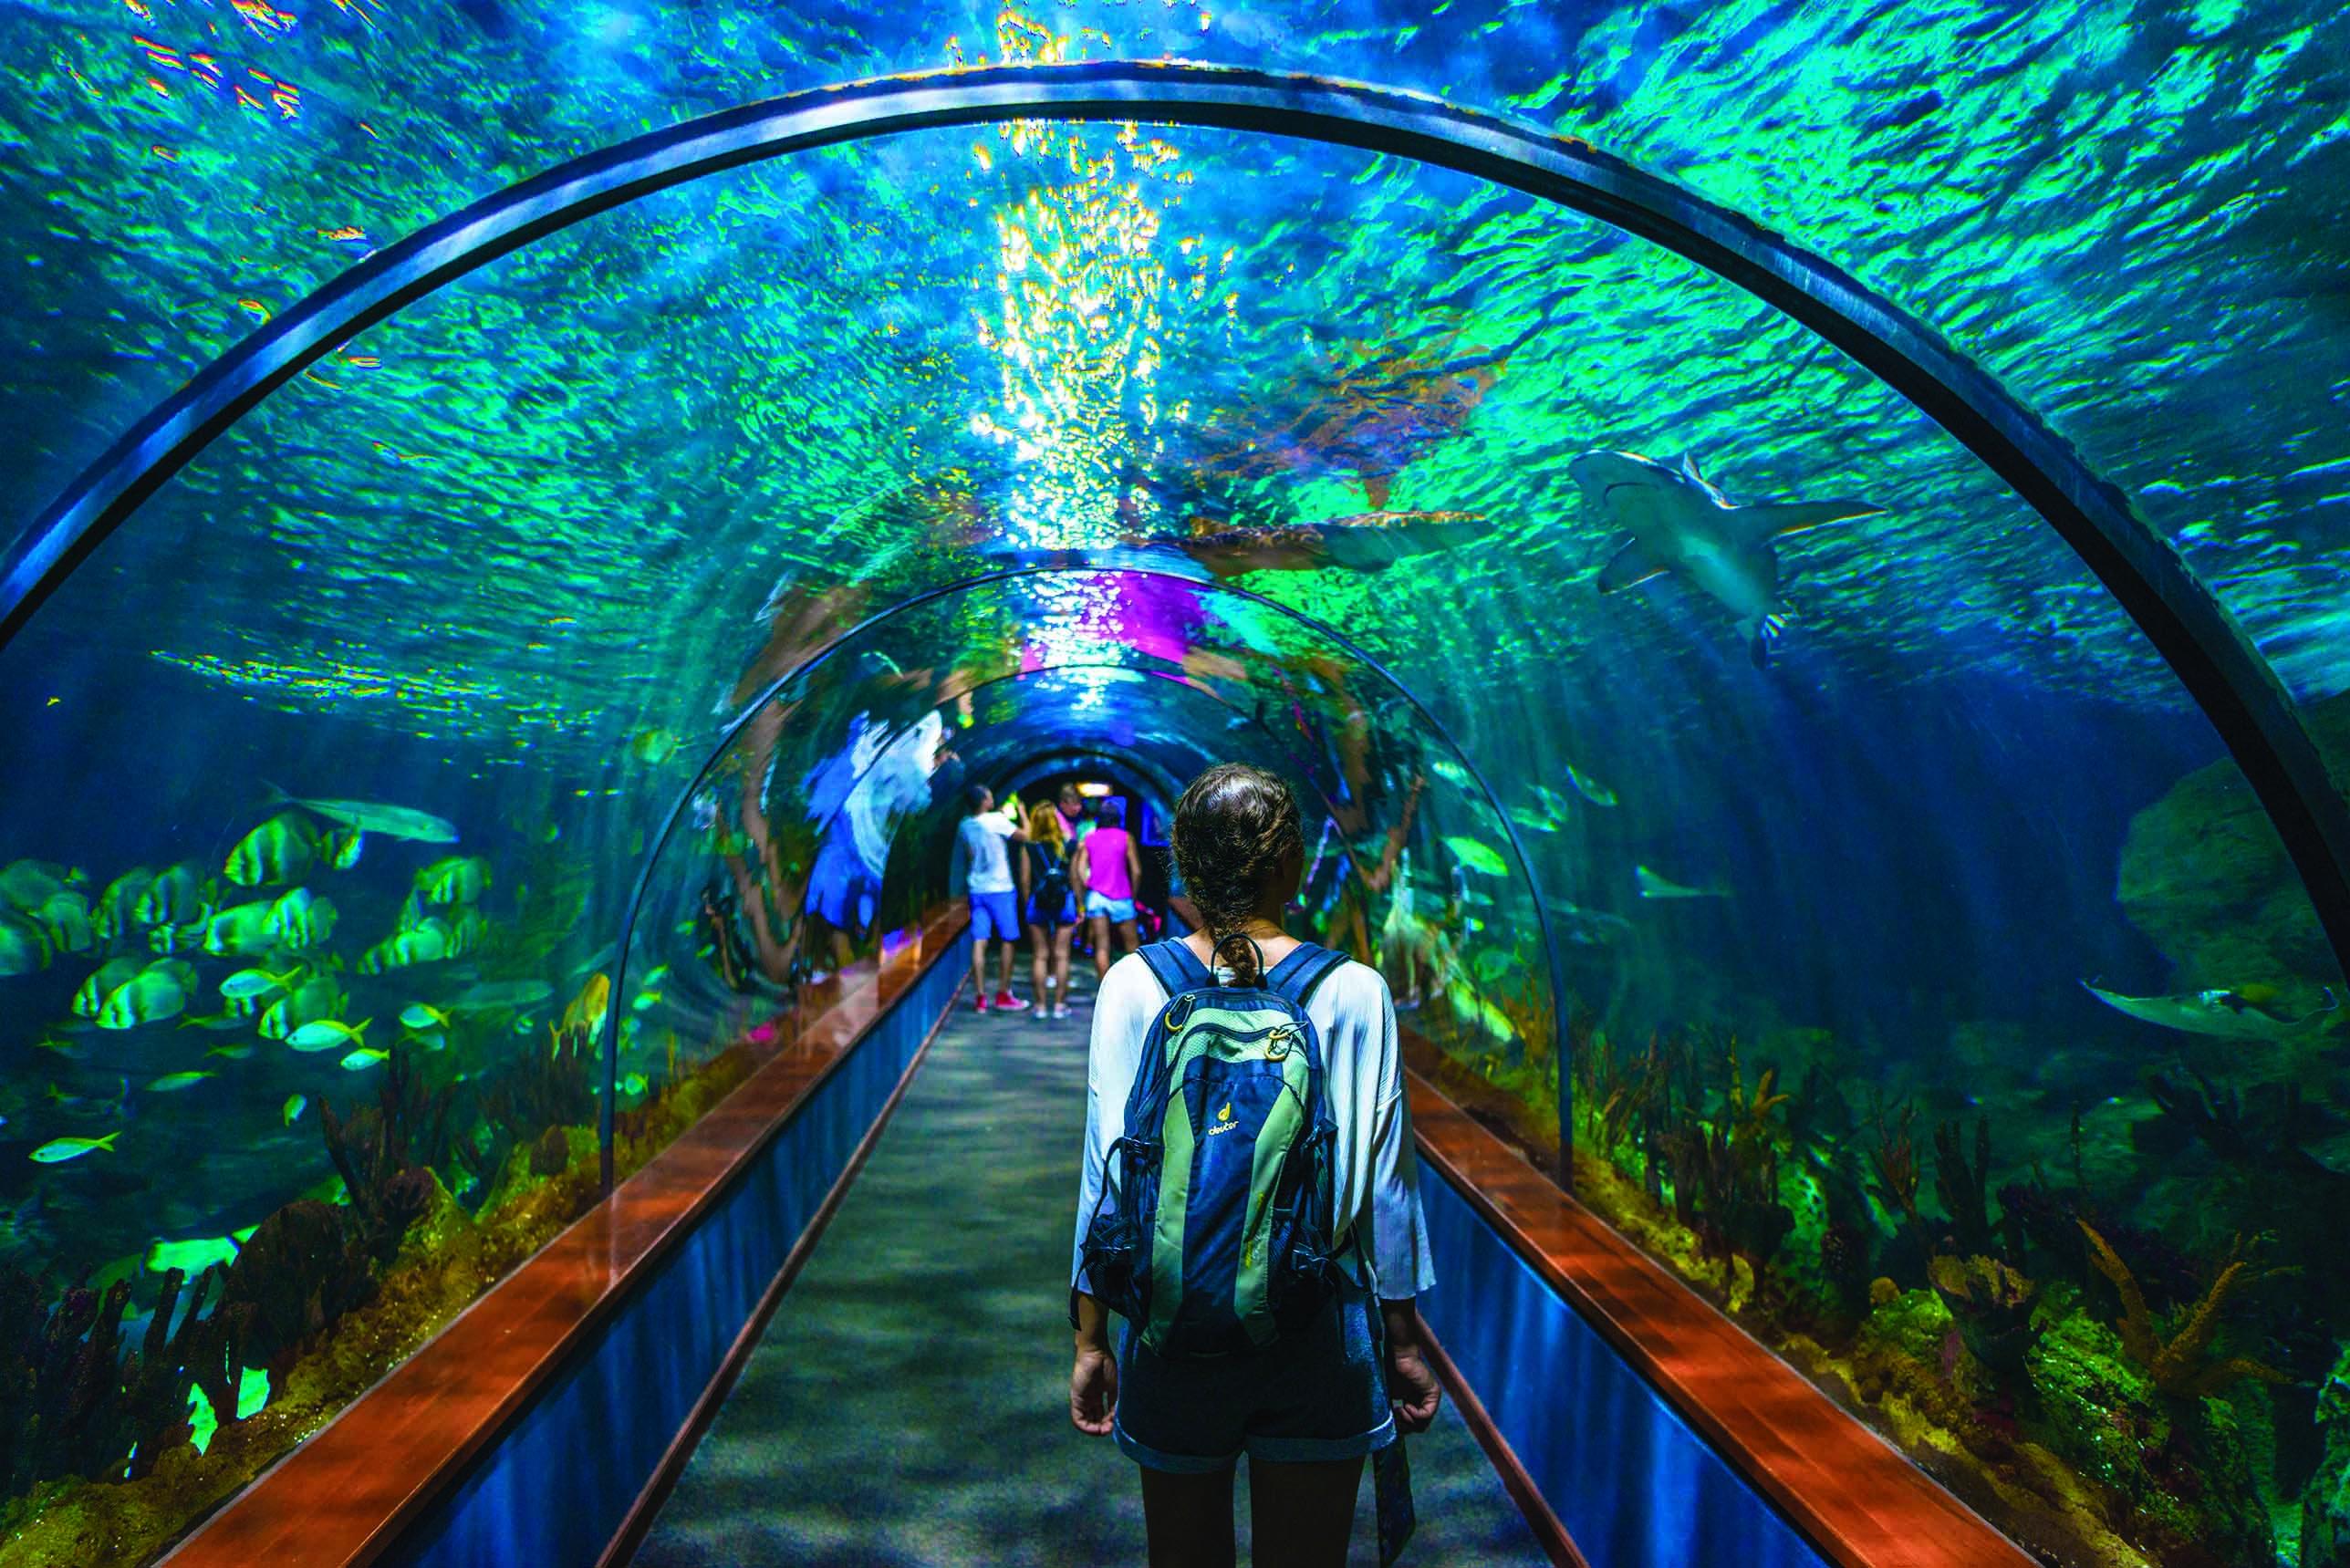 Young woman, visitor in aquarium tunnel, tunnel under aquarium, Loro Parque, Loro Park, Puerto de la Cruz, Tenerife, Canary Islands, Spain, Europe